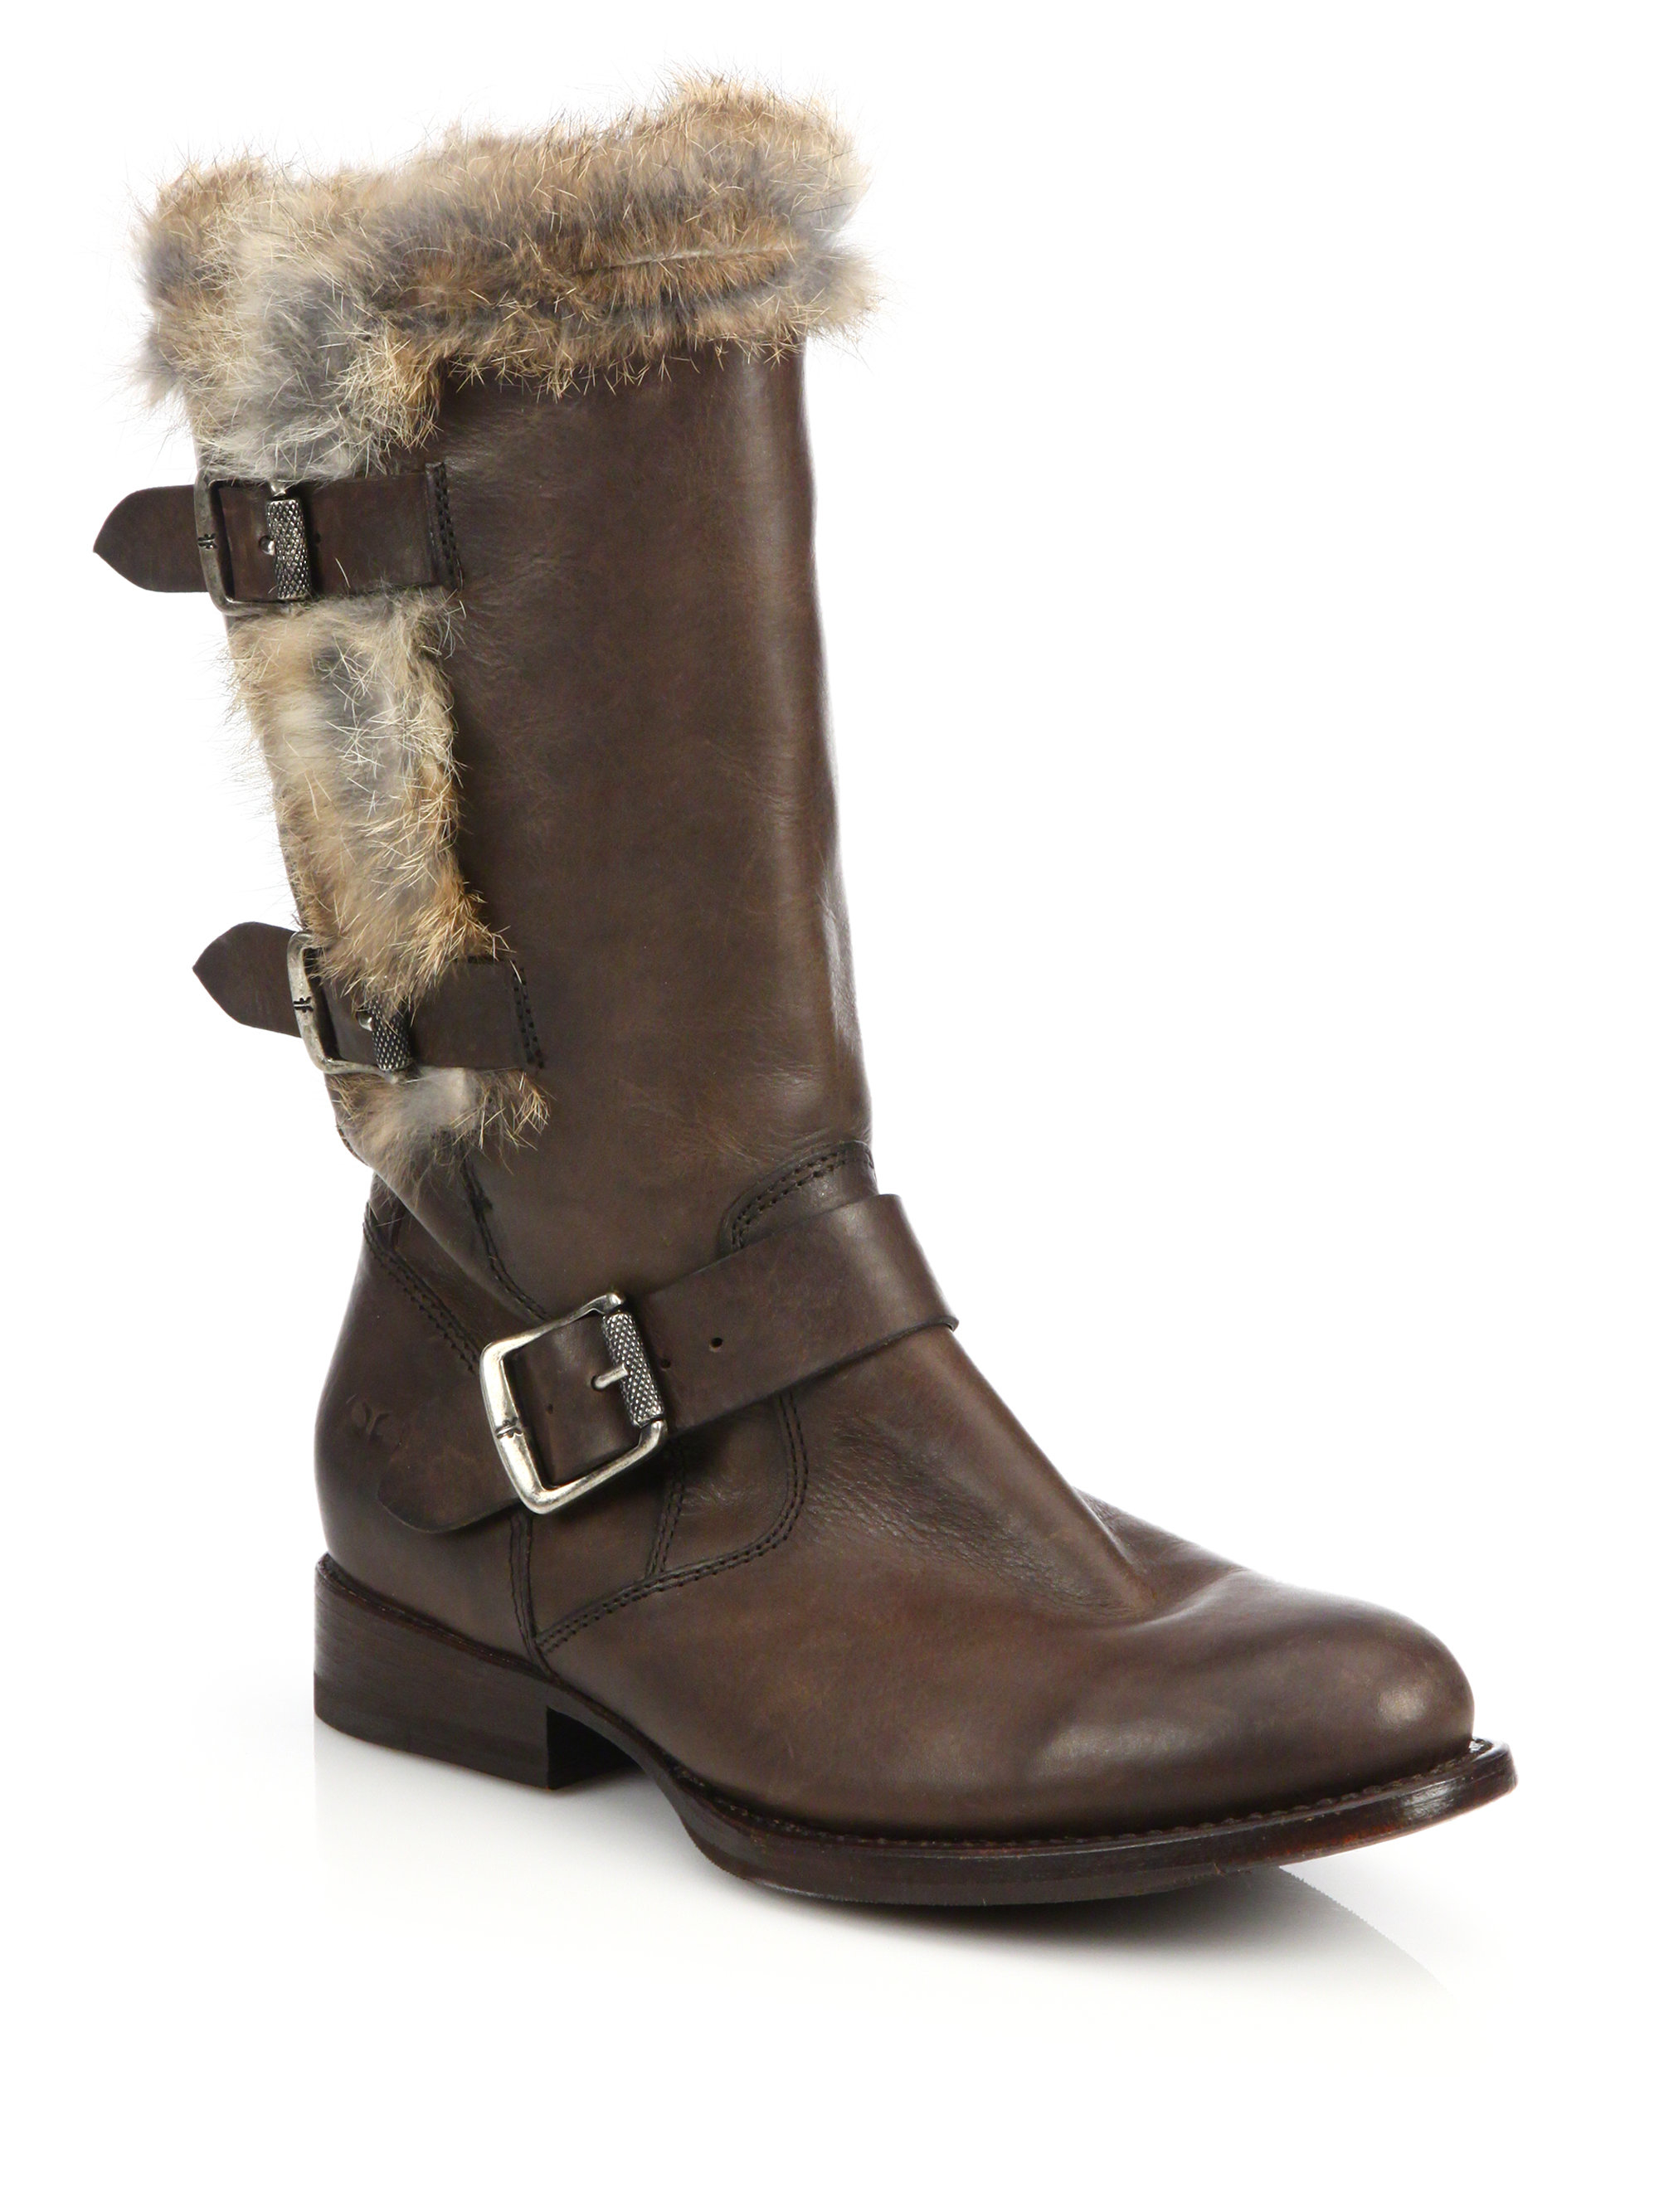 frye moto rabbit fur trimmed leather mid calf